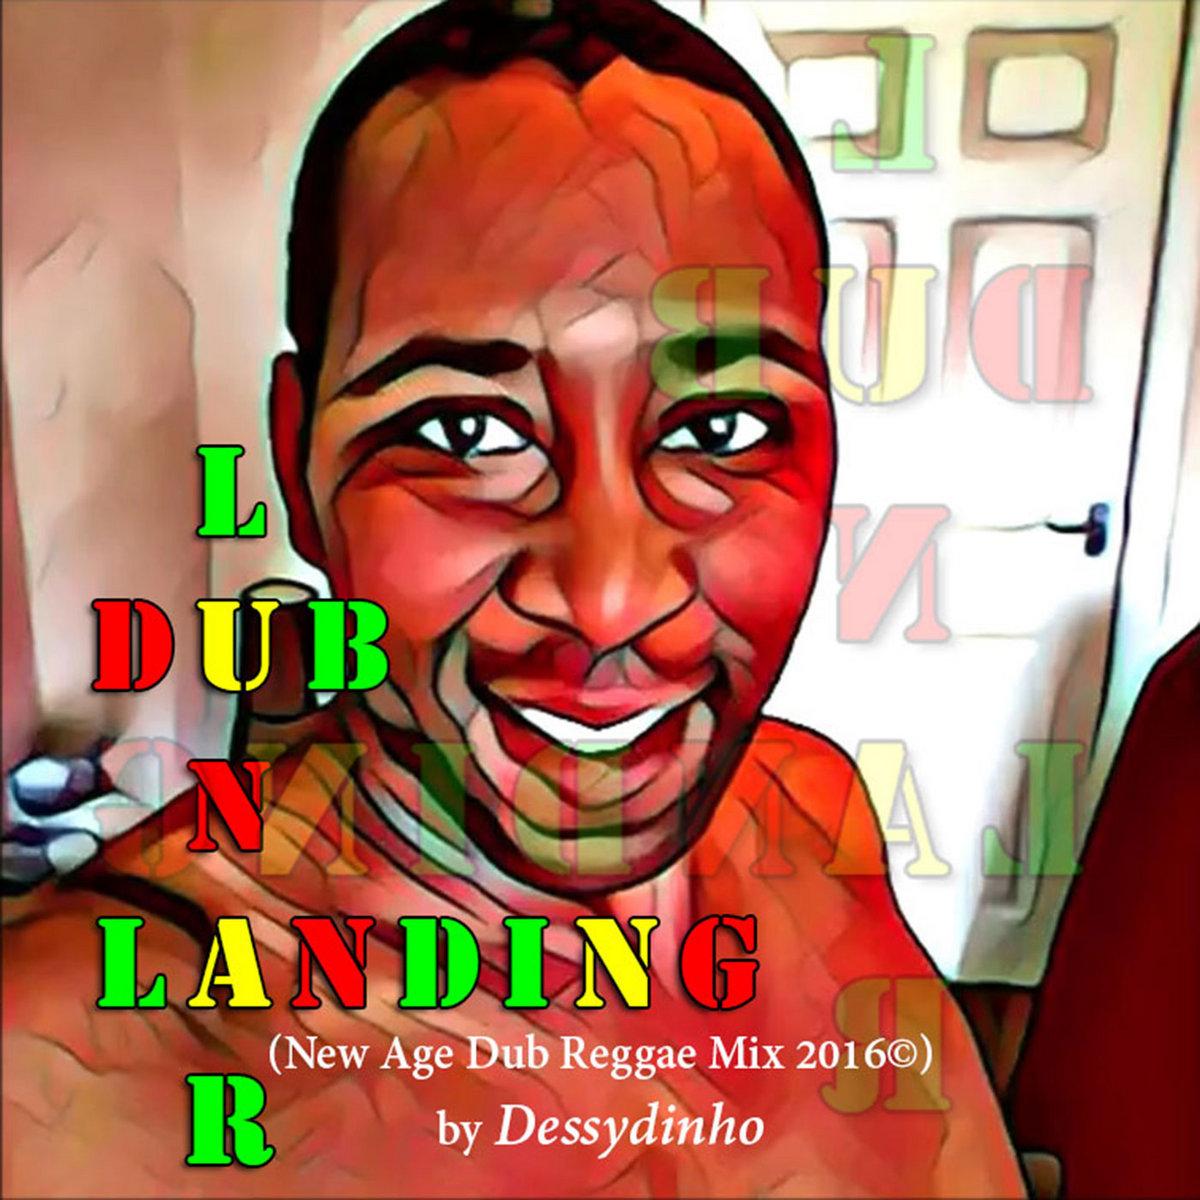 DUB LUNAR LANDING (DESSYDINHO NEW AGE DUB REGGAE MIX 2016